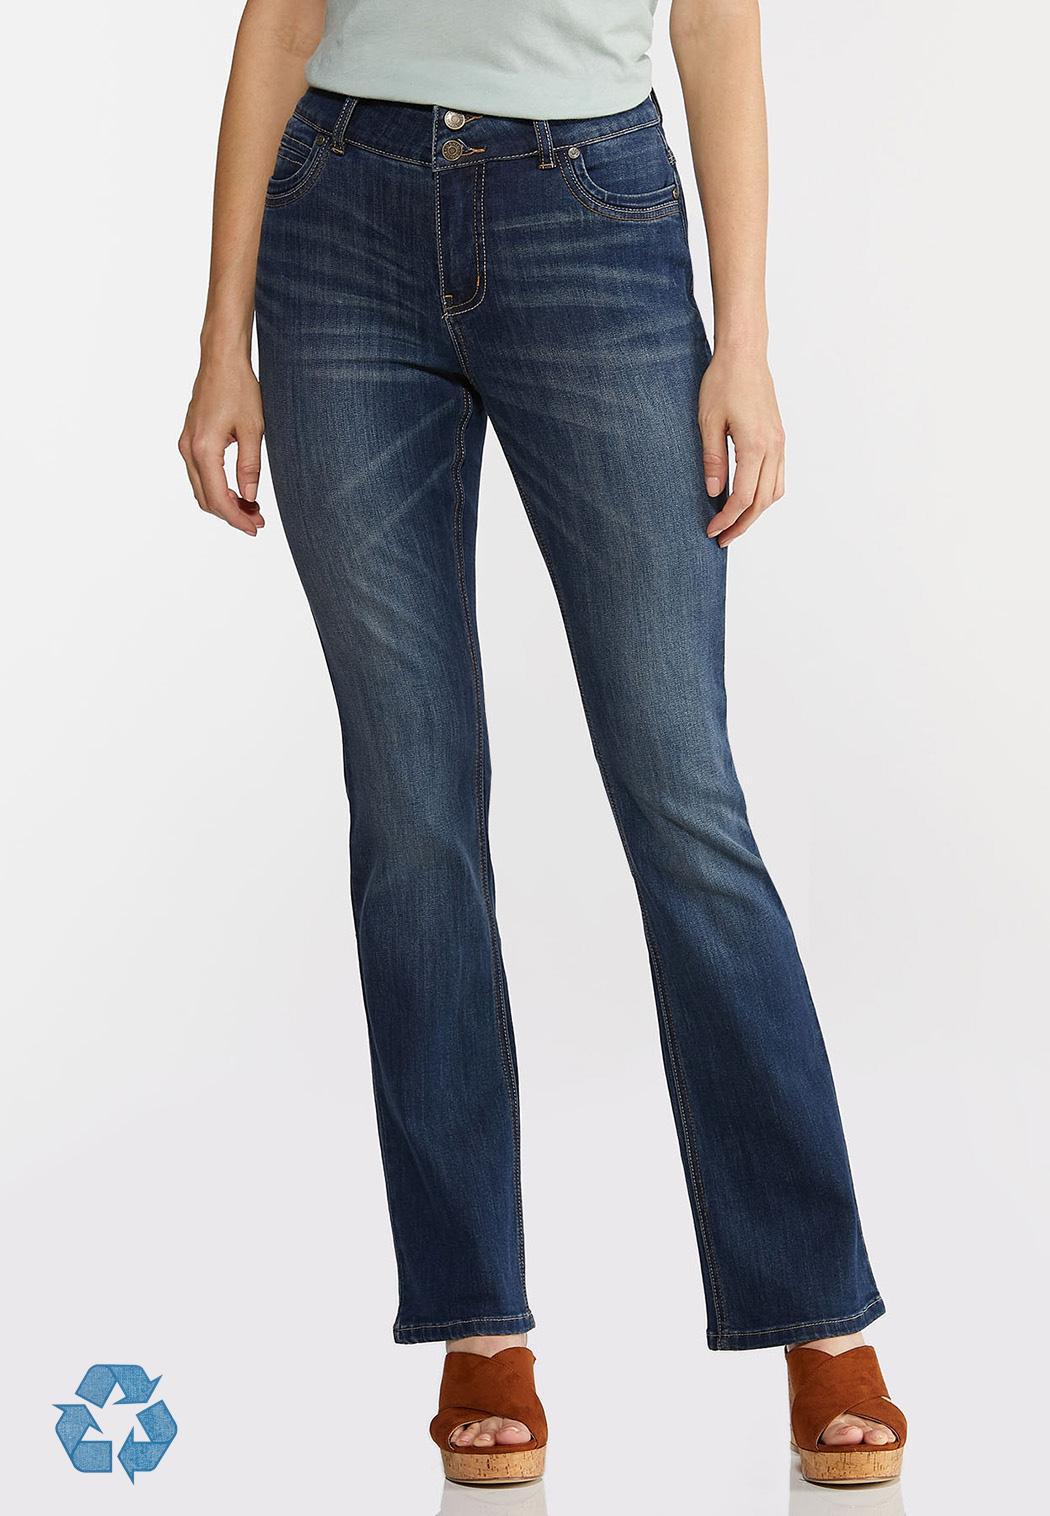 Petite High-Rise Bootcut Jeans (Item #44376922)